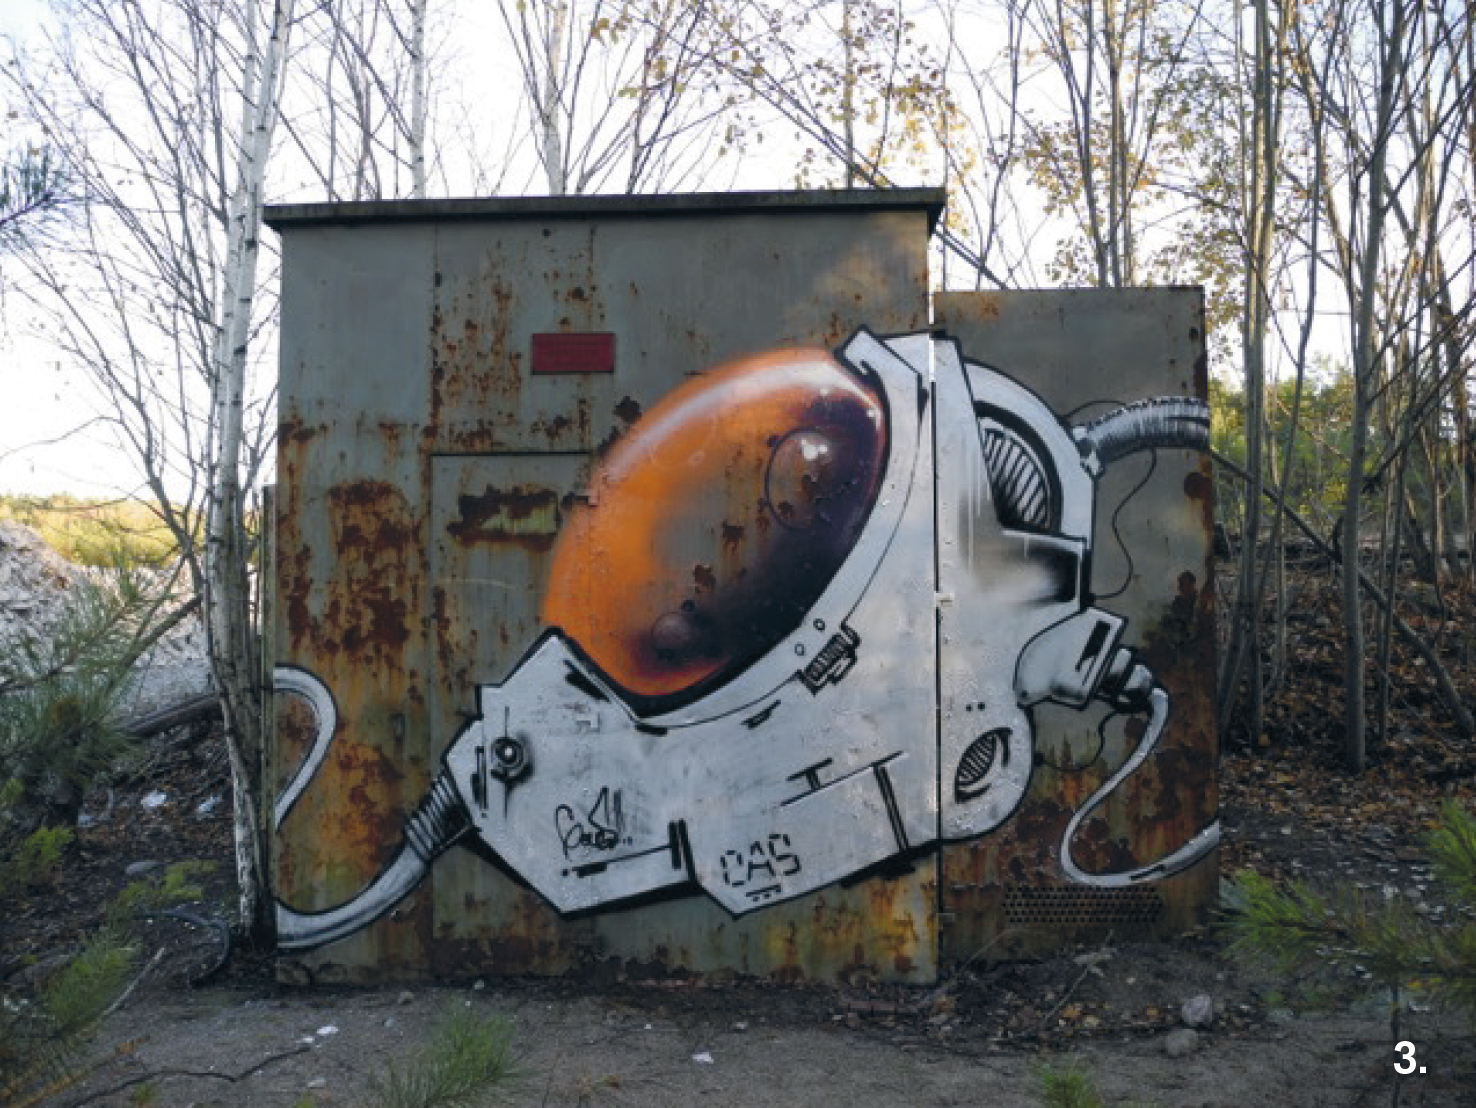 Gouge_Stockholm_Graffiti_Wallery_3